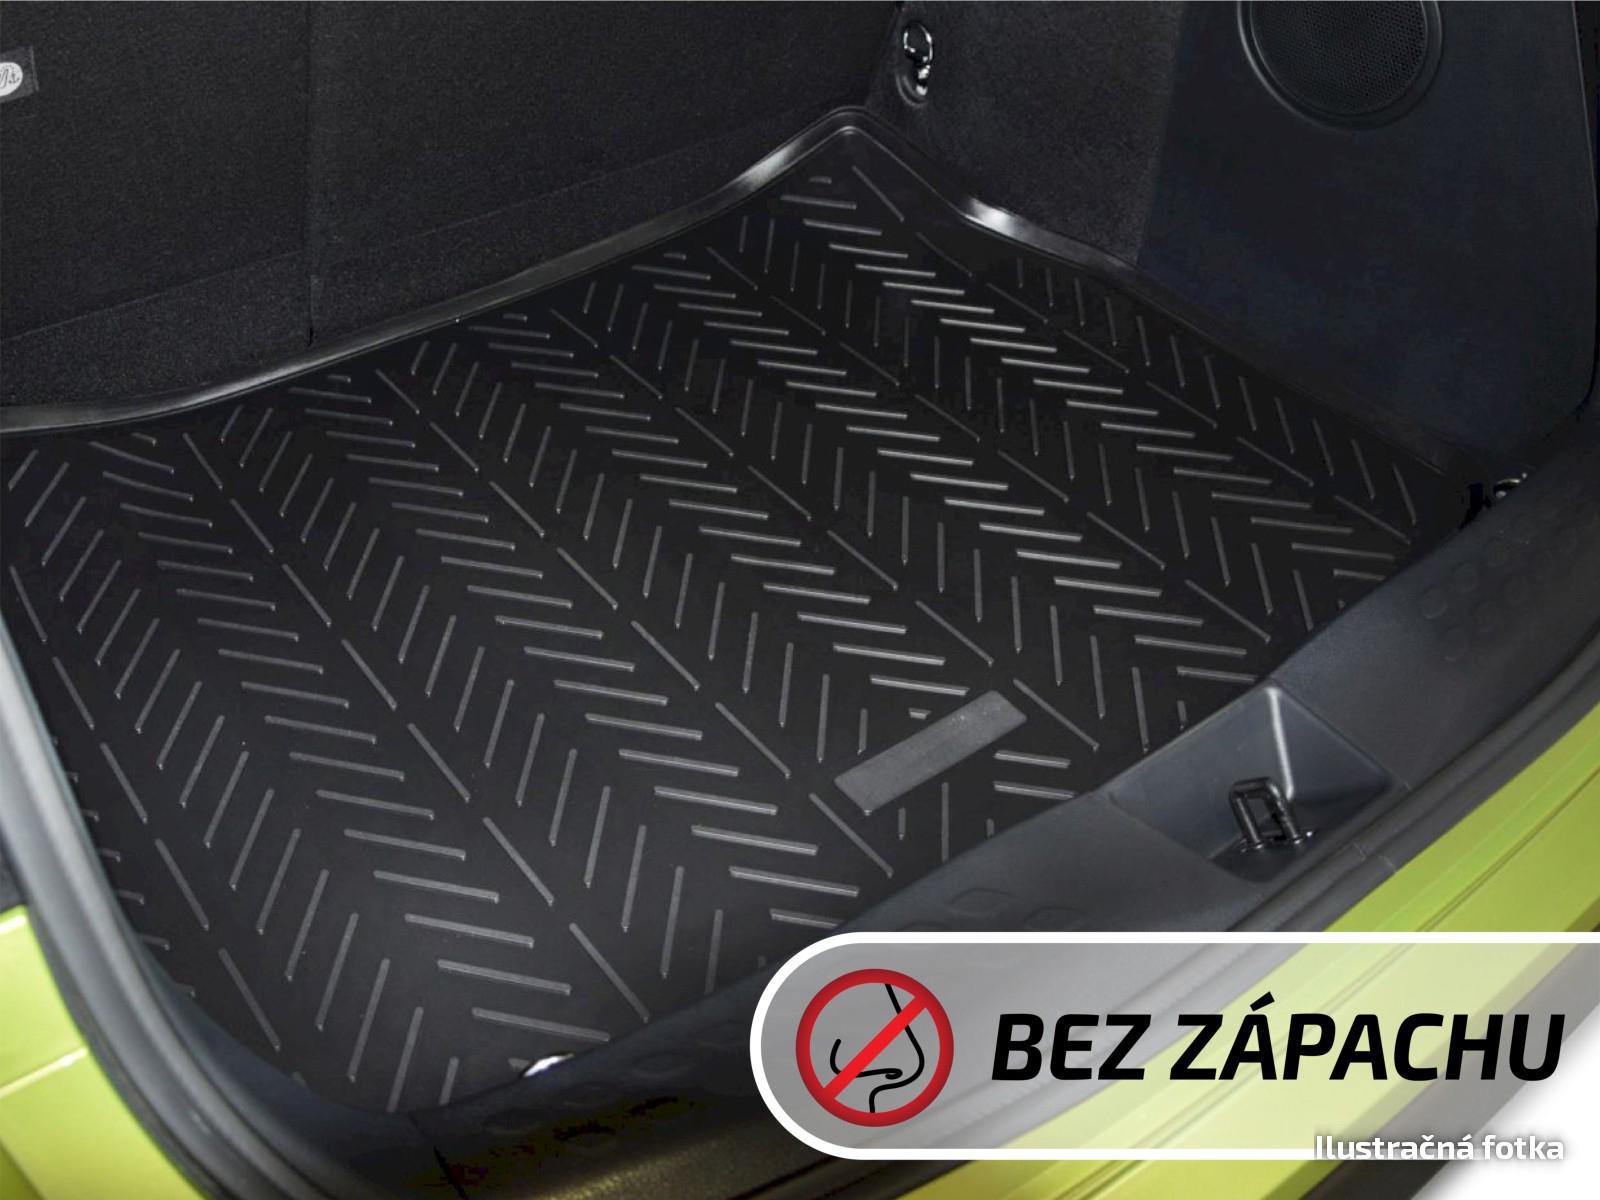 Poza cu Tavita de portbagaj Premium, Renault Clio, 2012-2019